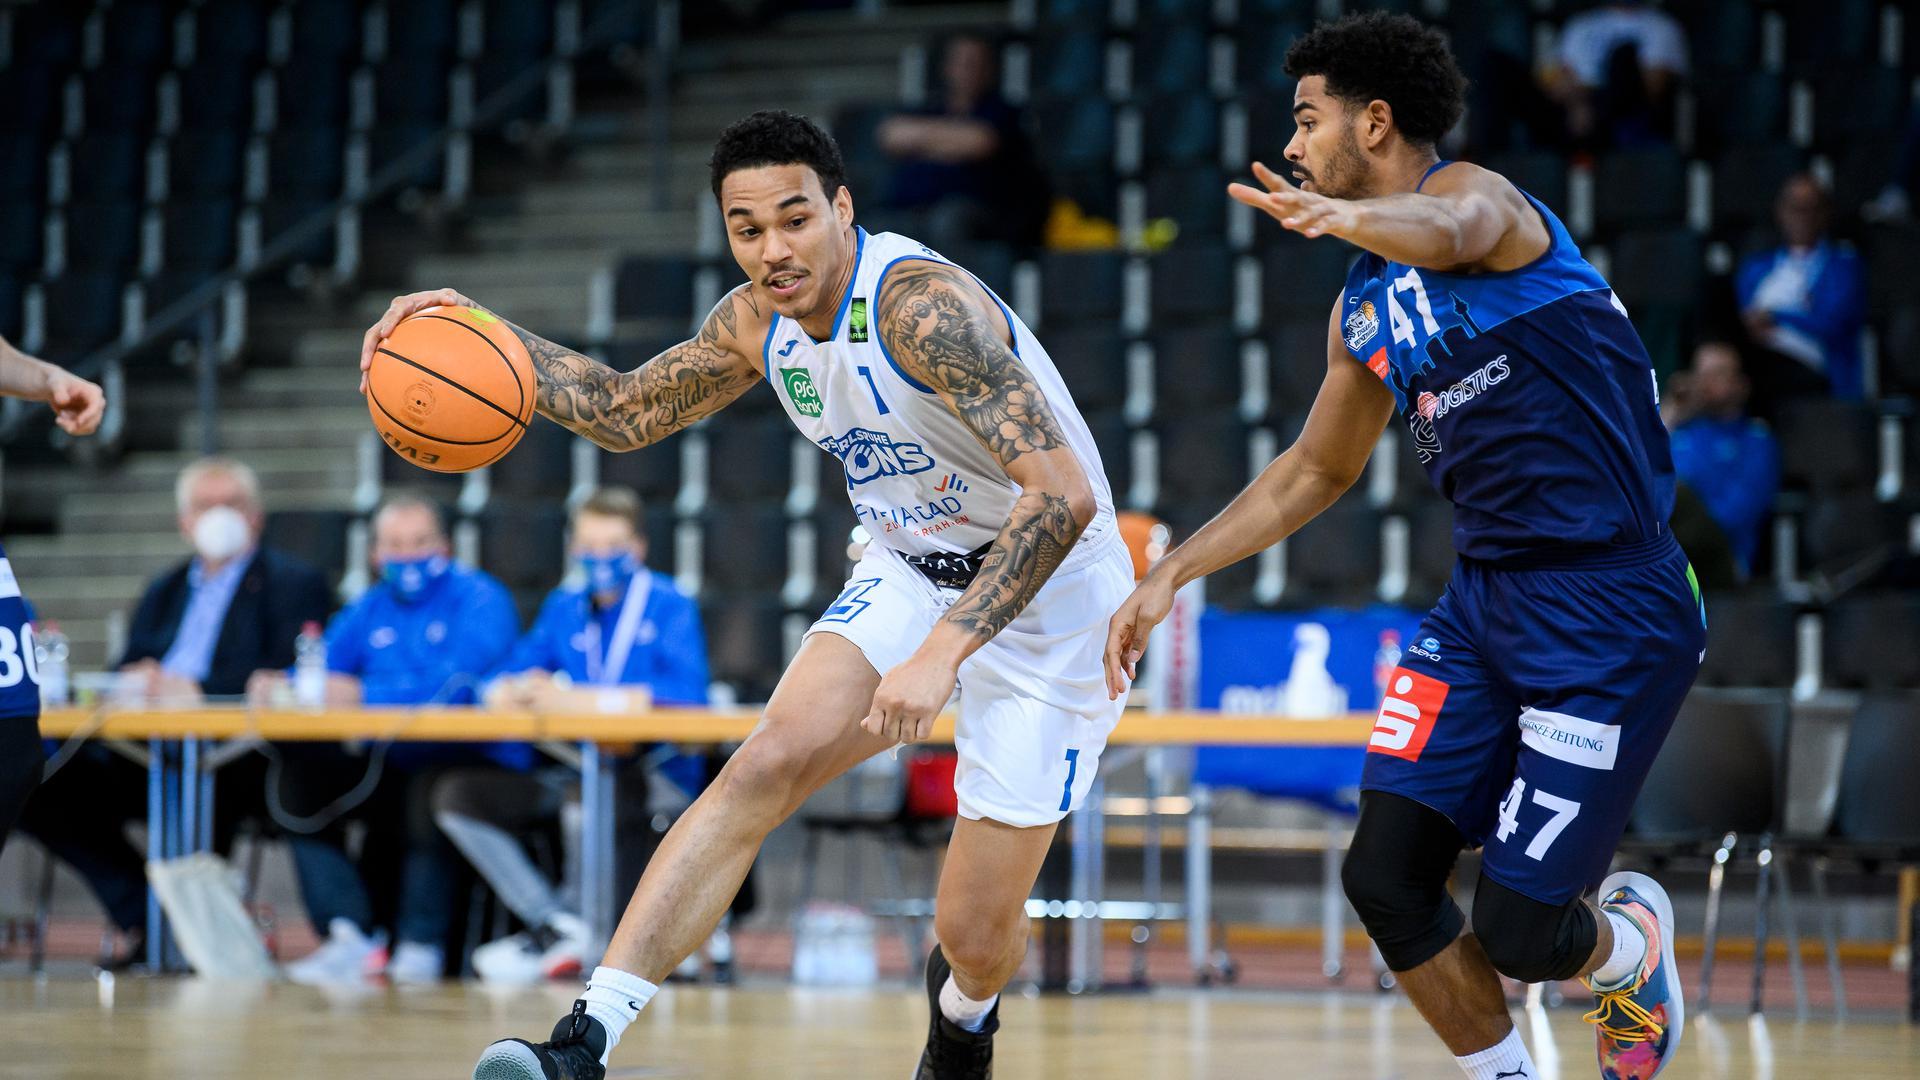 Kavin John Gilder-Tilbury (Lions) im Zweikampf mit Marvin Heckel (Bremerhaven).  GES/ Basketball/ ProA: PSK Lions - Eisbaeren Bremerhaven, 27.12.2020 --